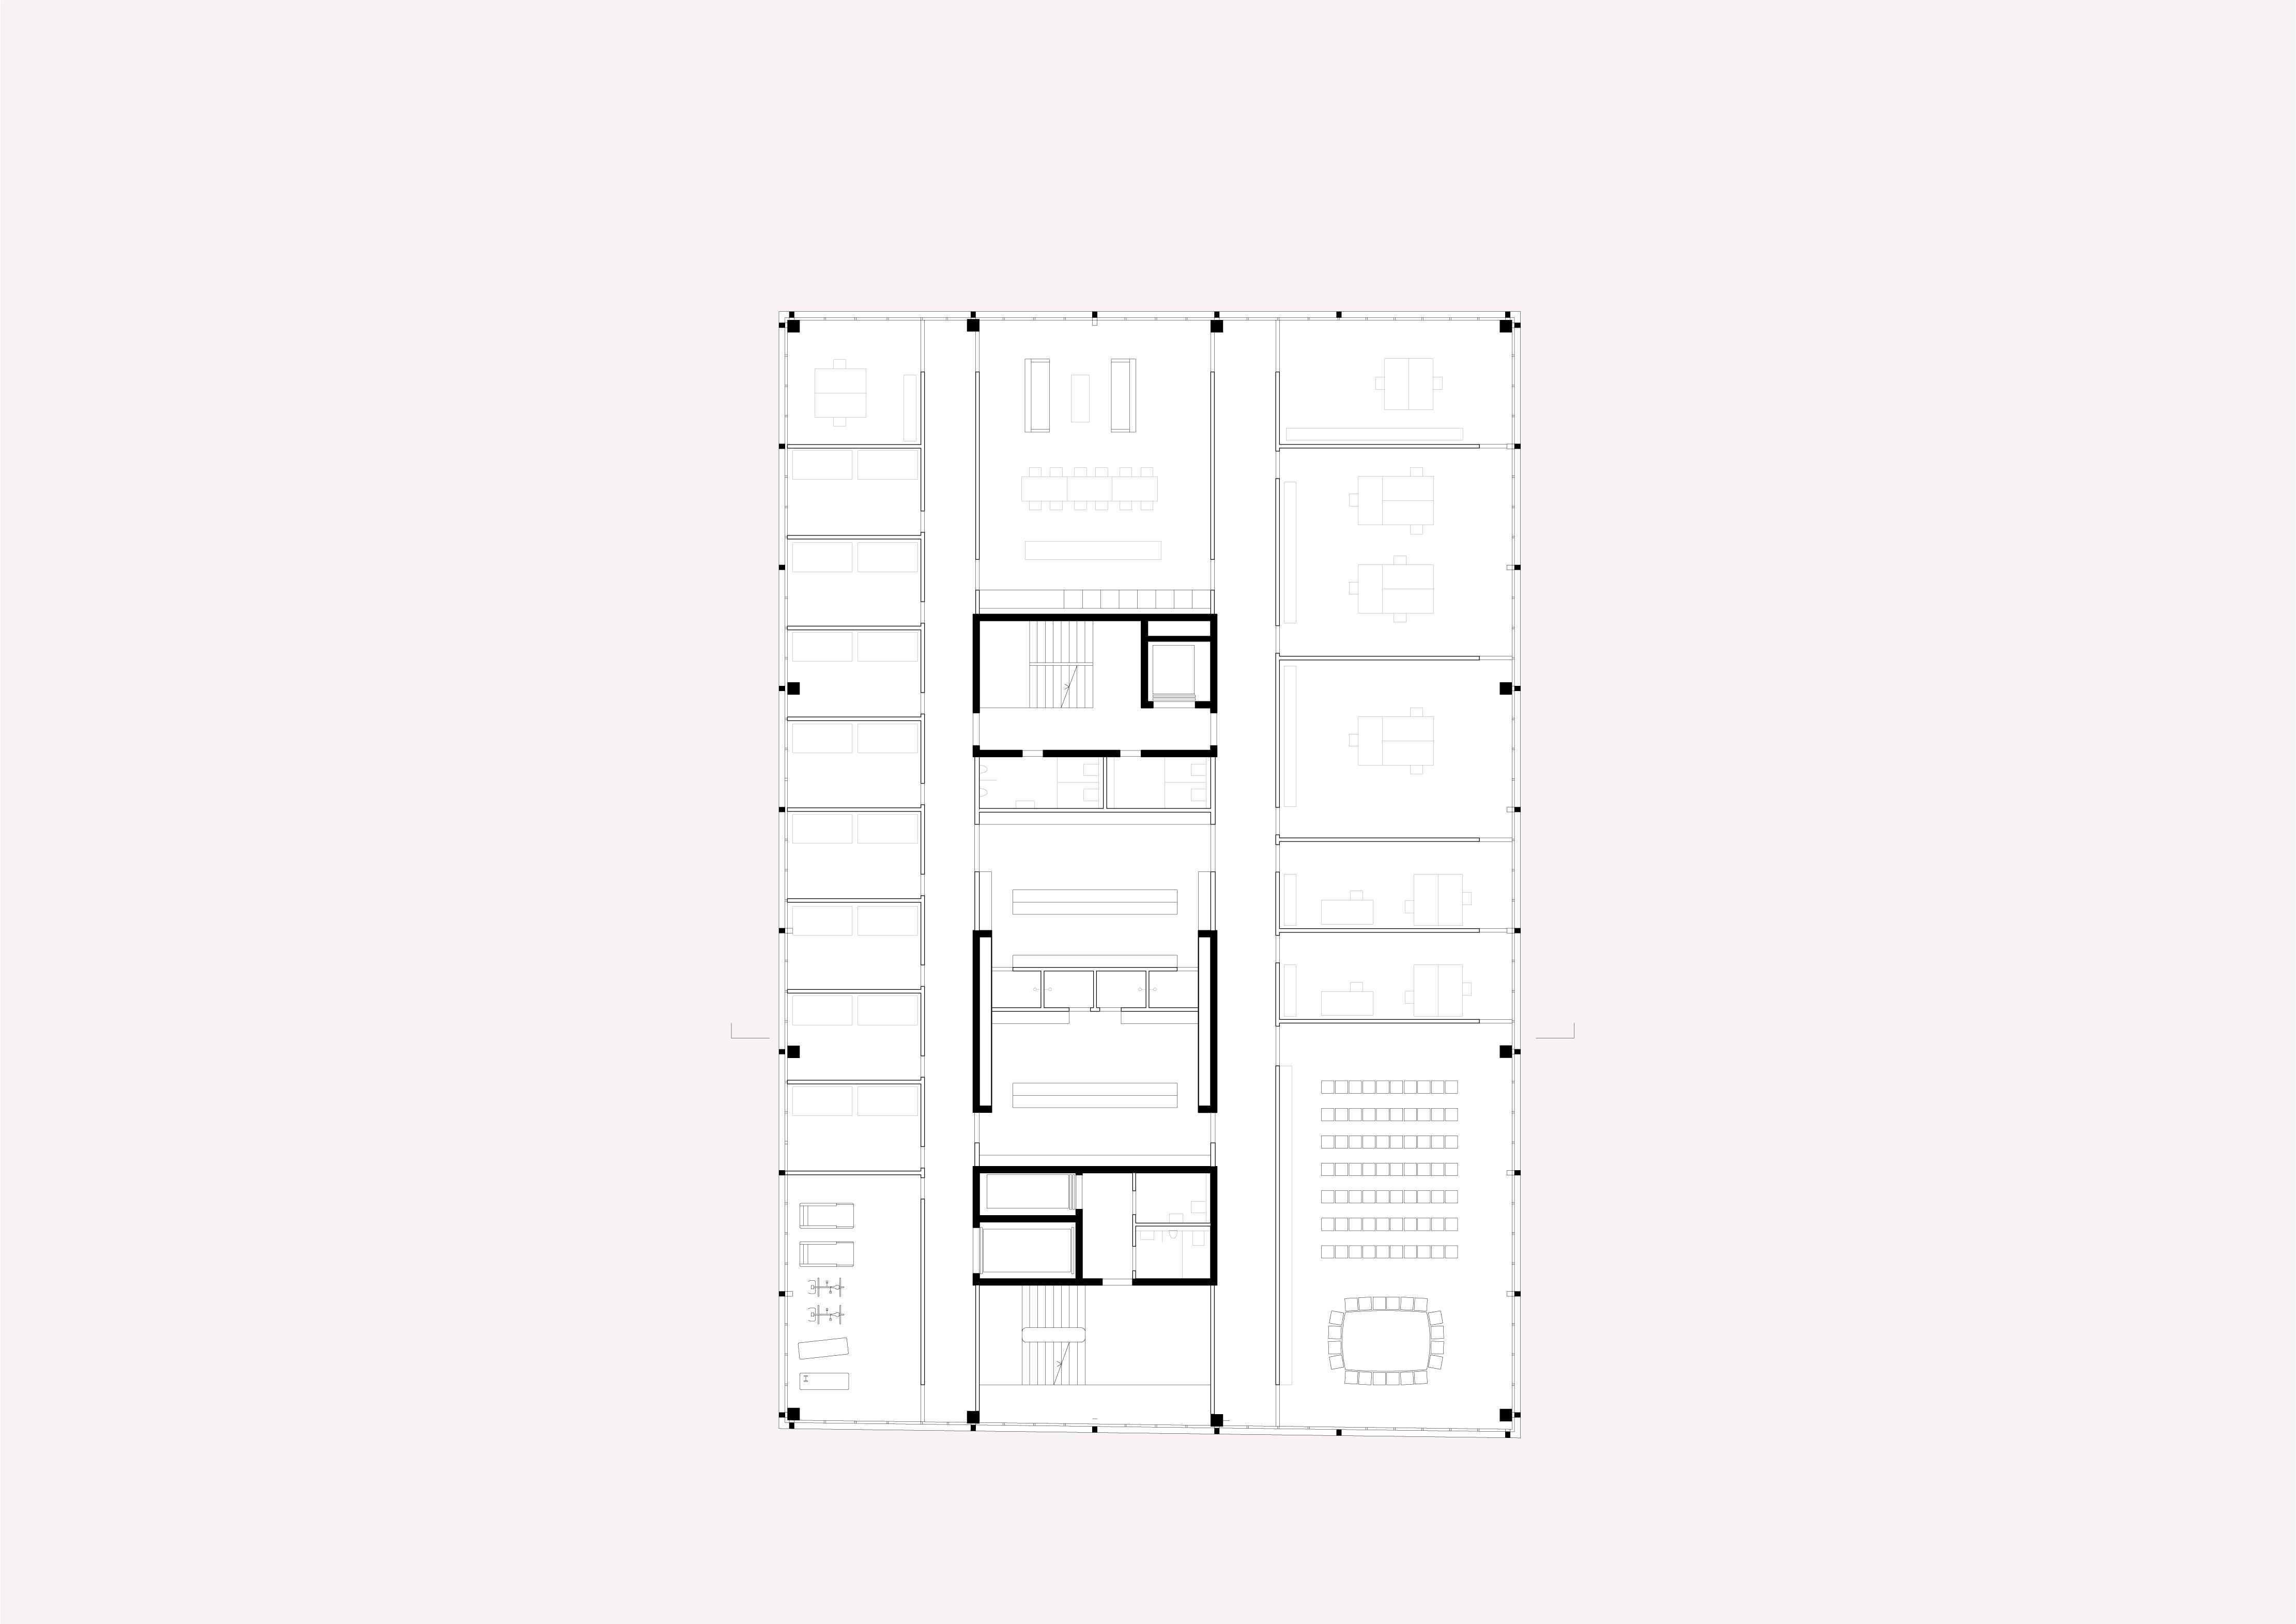 Neubau Bieler Stadtarchiv und Ambulanzgarage Region Biel 1OG STUDIO CORNEL STAEHELI